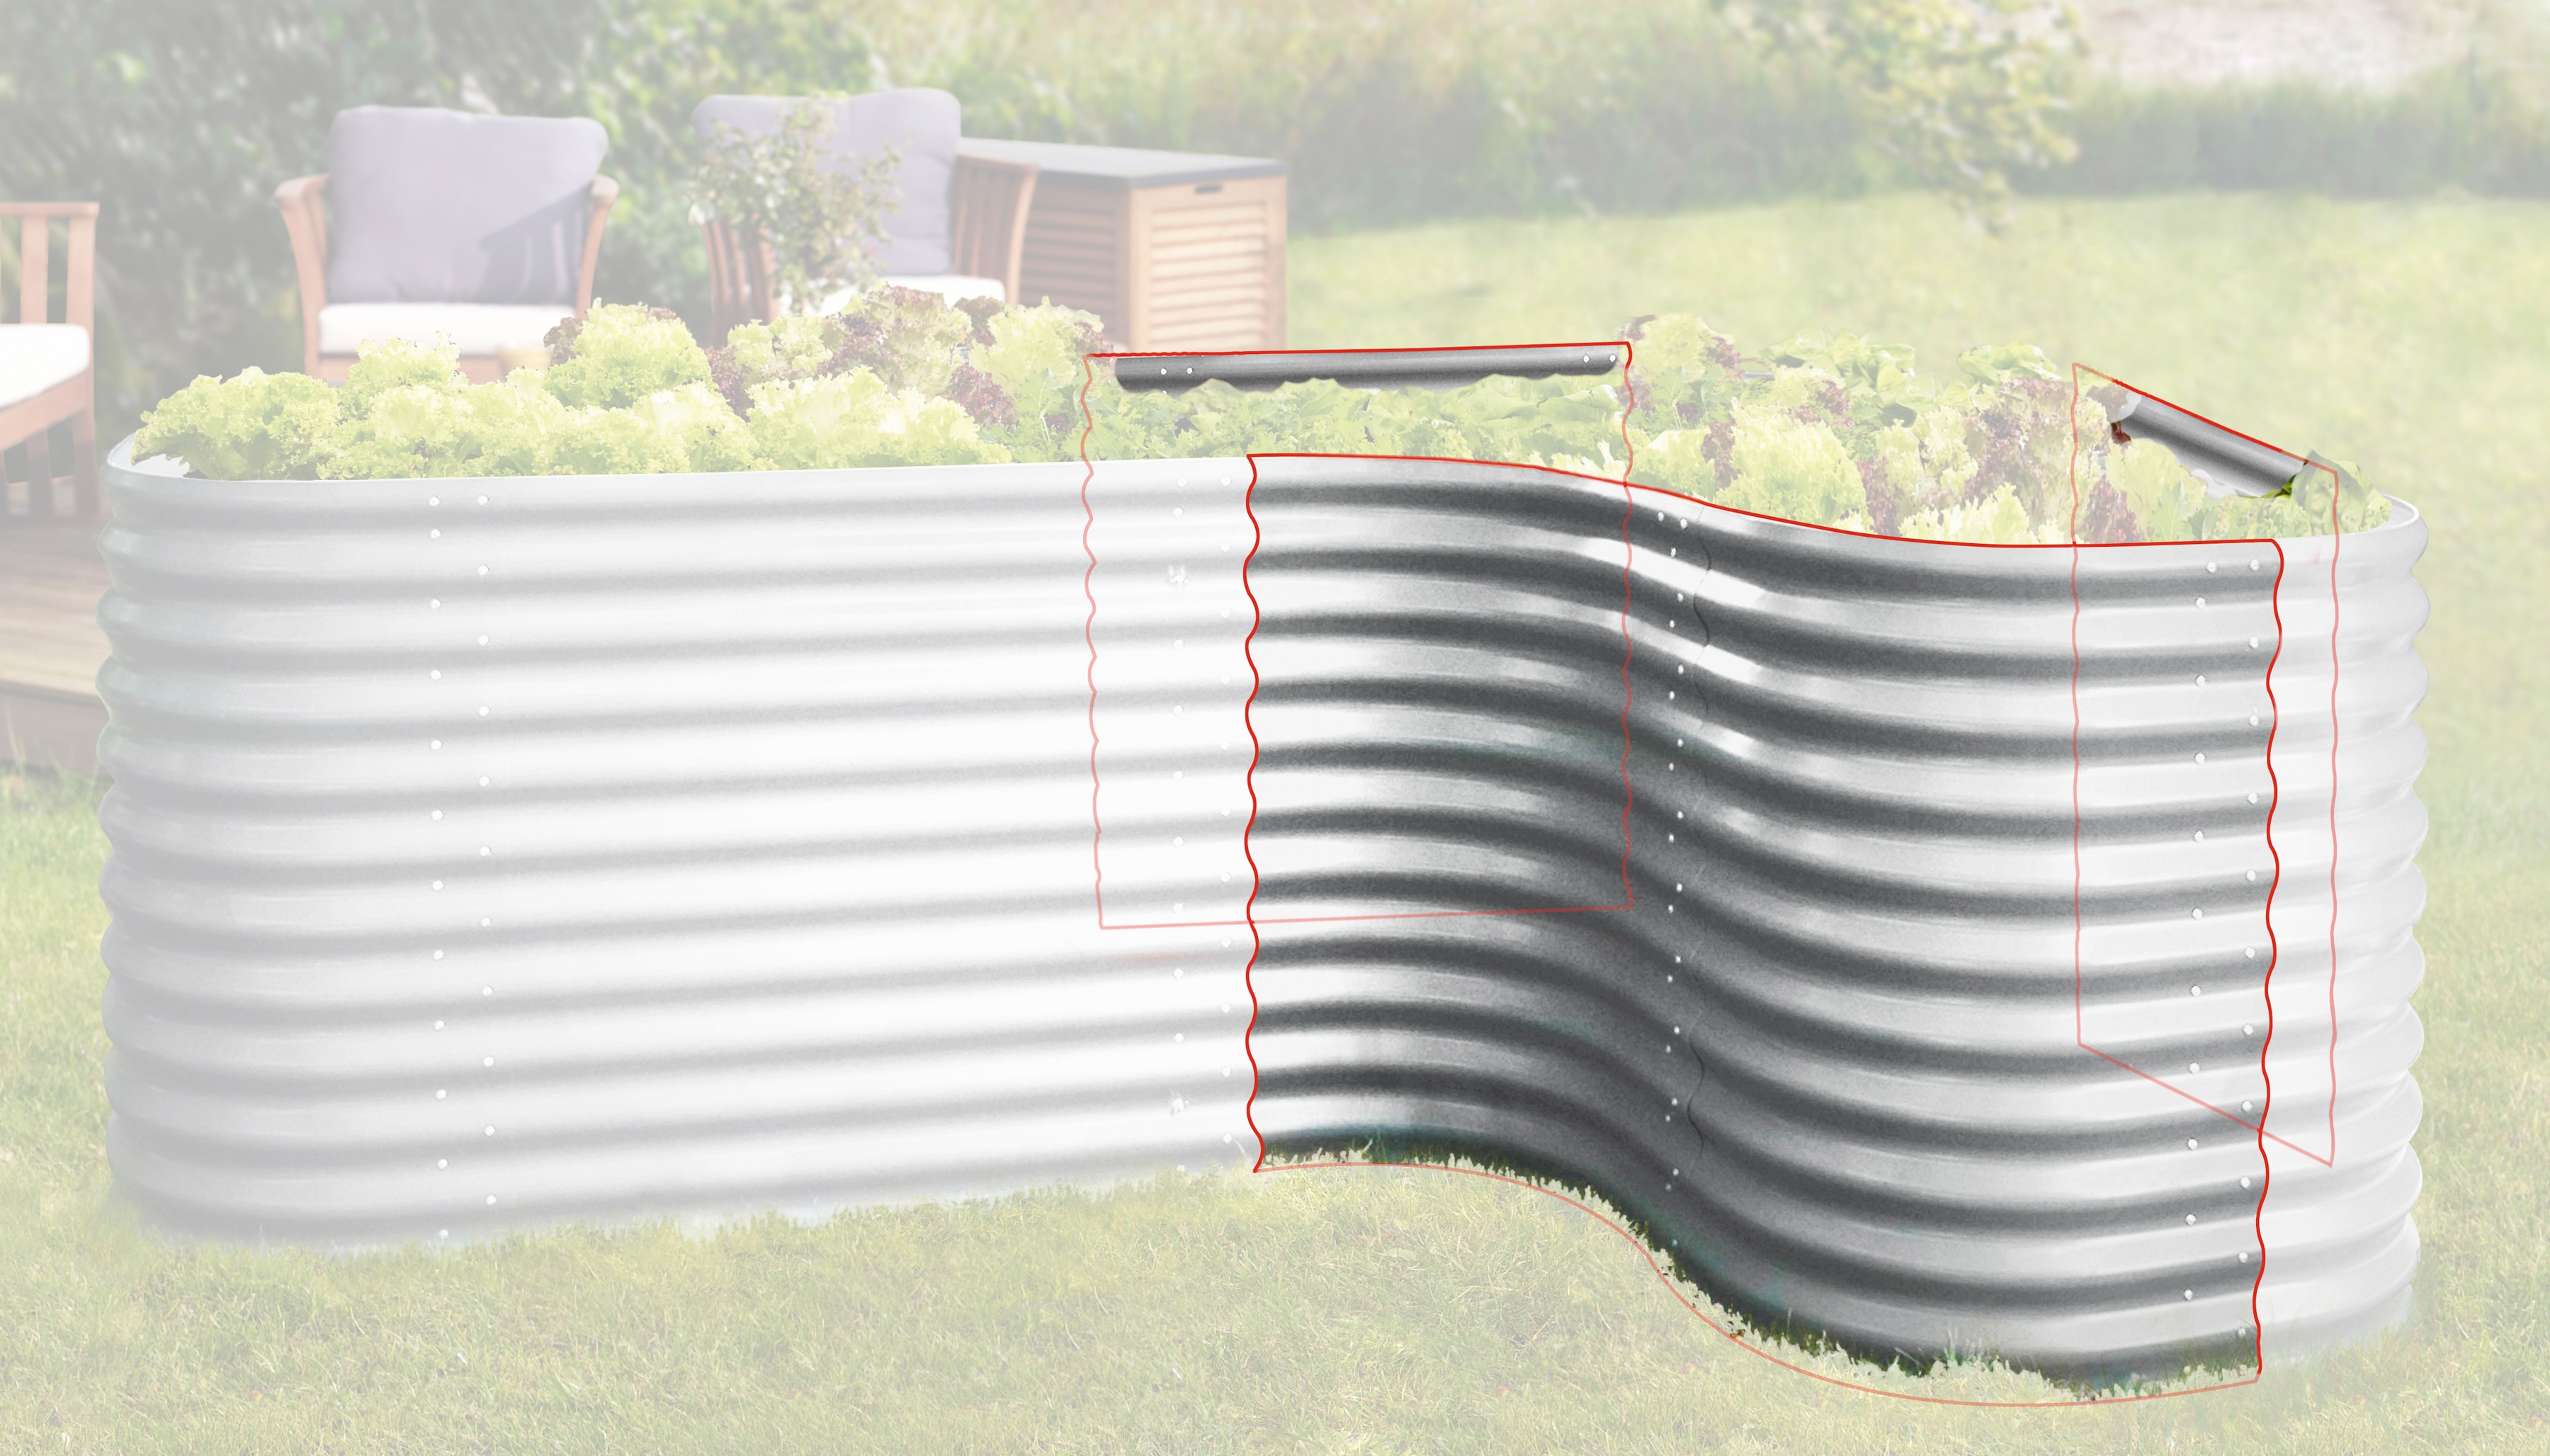 Hochbeet-Lxbxh-80X80X86-Cm-Aluminiumfarben-Vitavia-Hochbeete-Zubehoer Indexbild 4